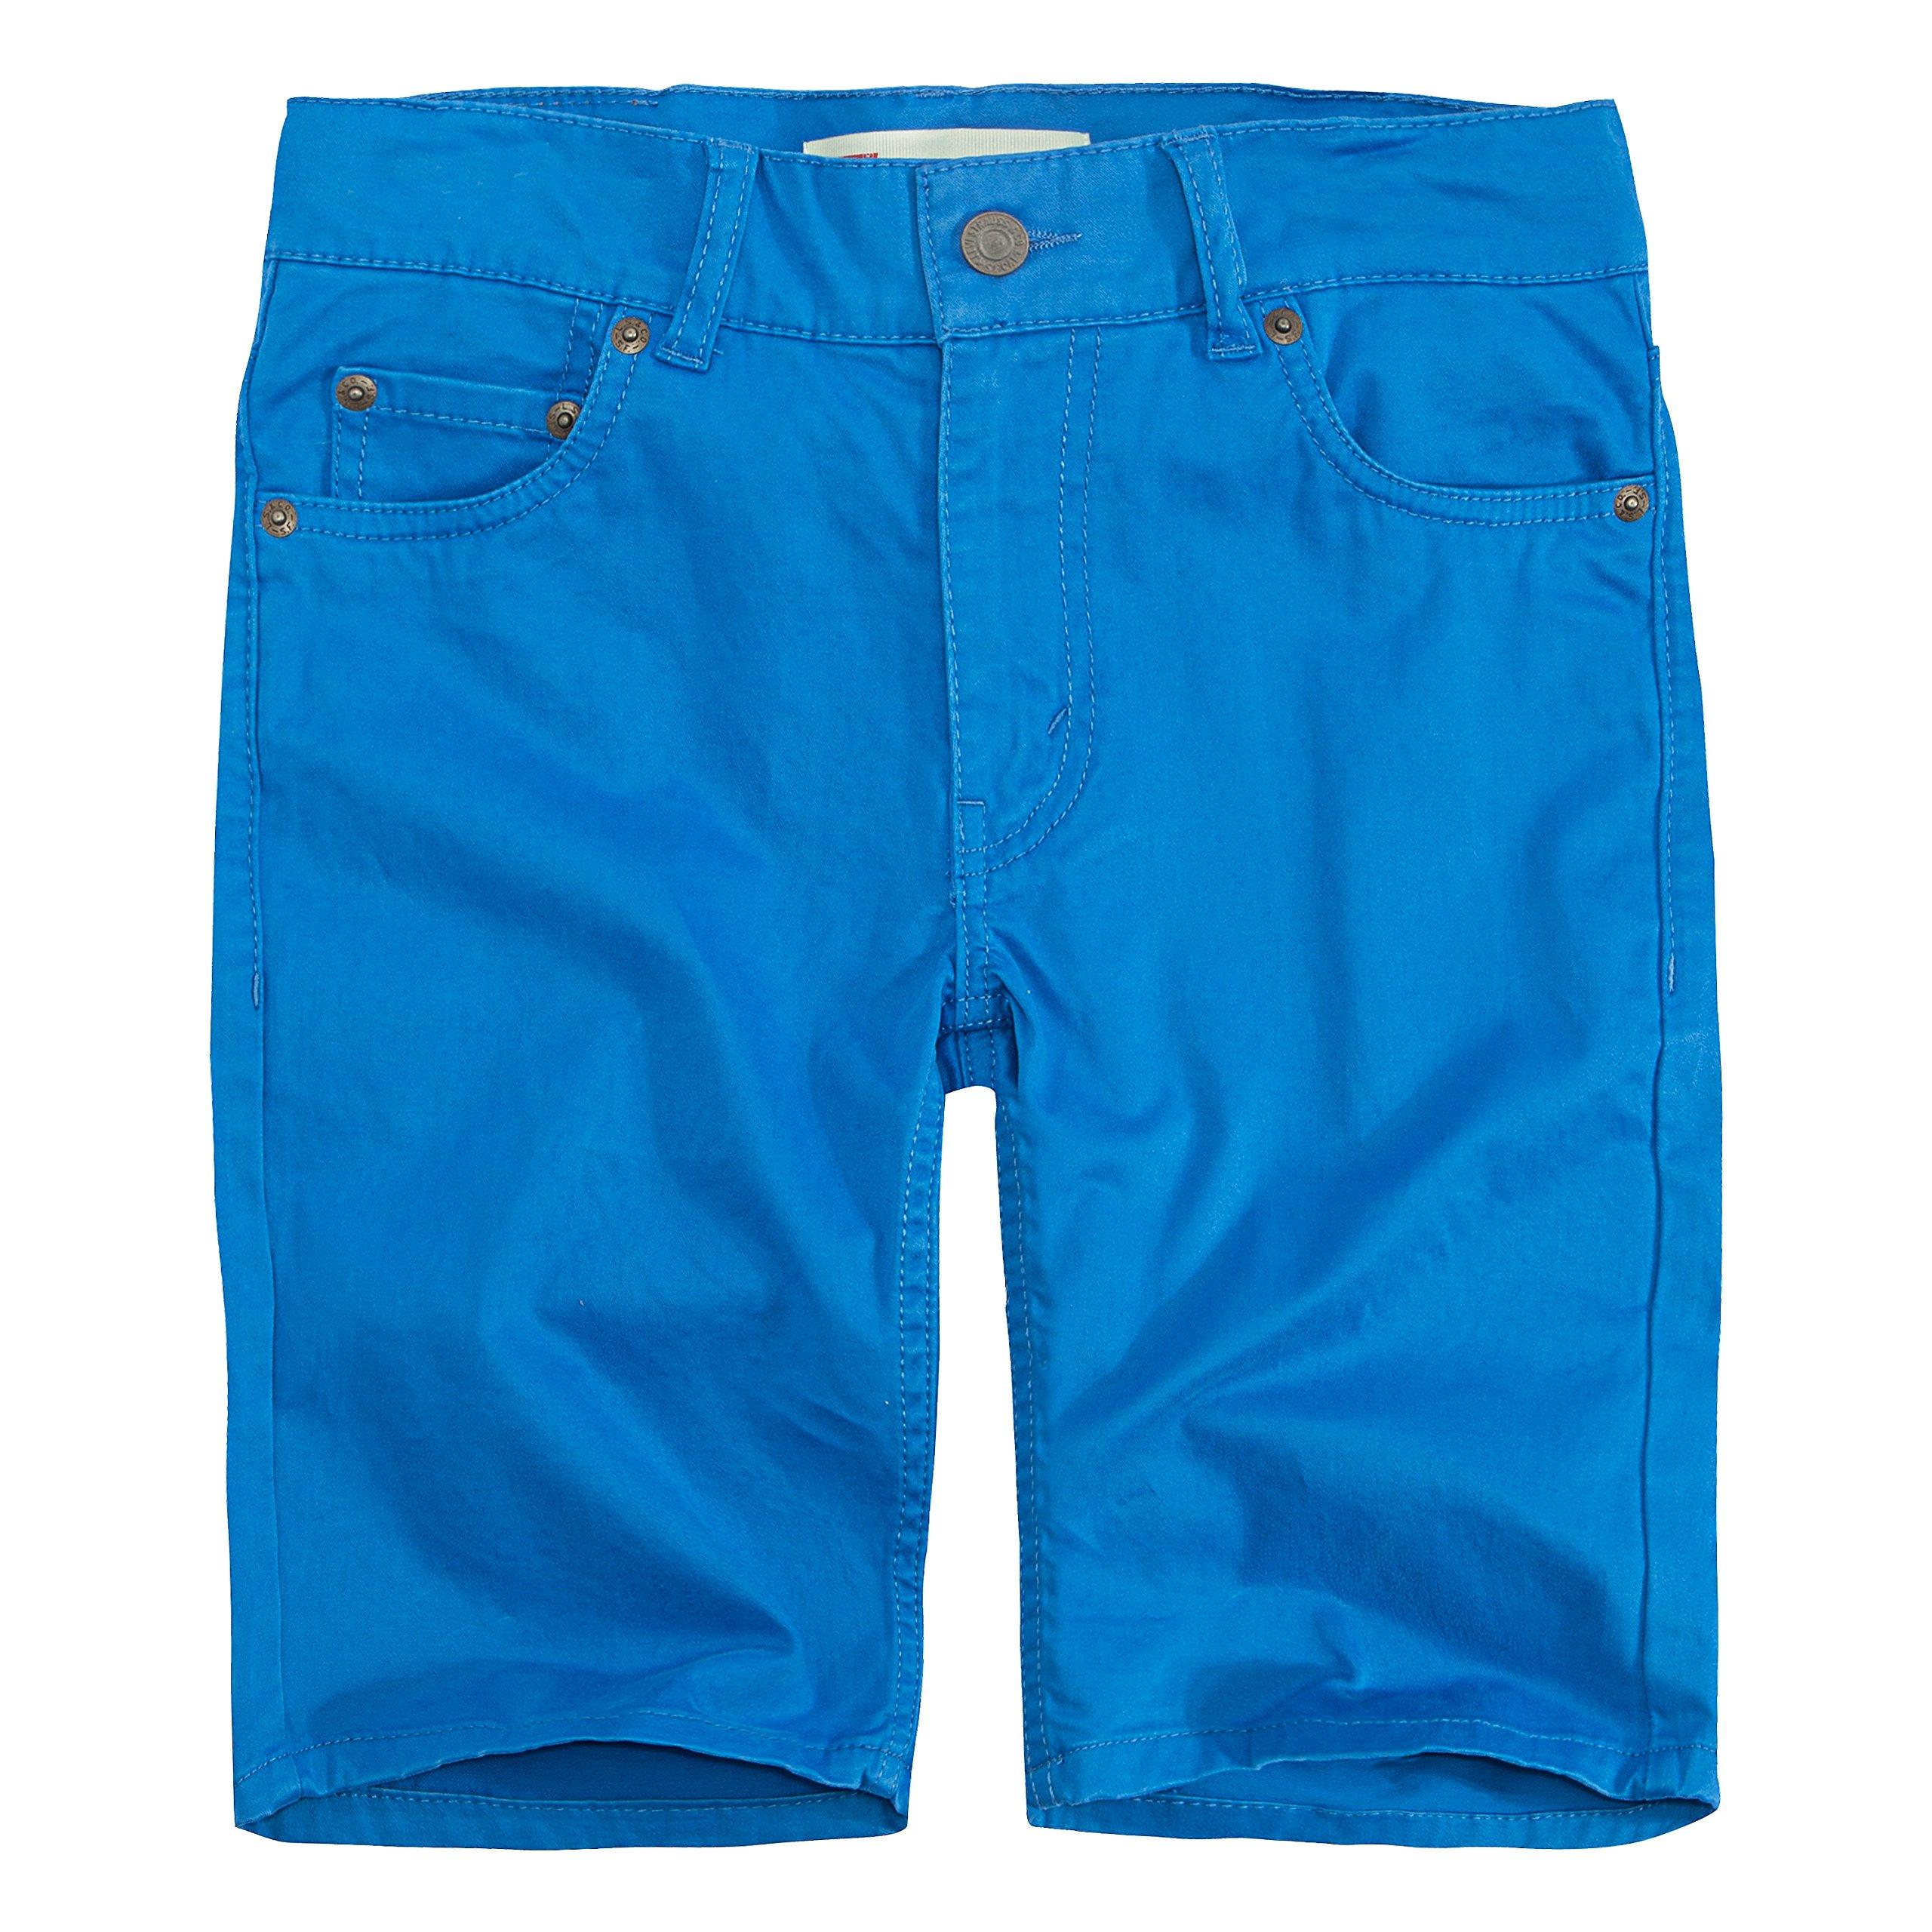 Levi's Boys' Big 511 Slim Fit Soft Brushed Shorts, Princess Blue, 12